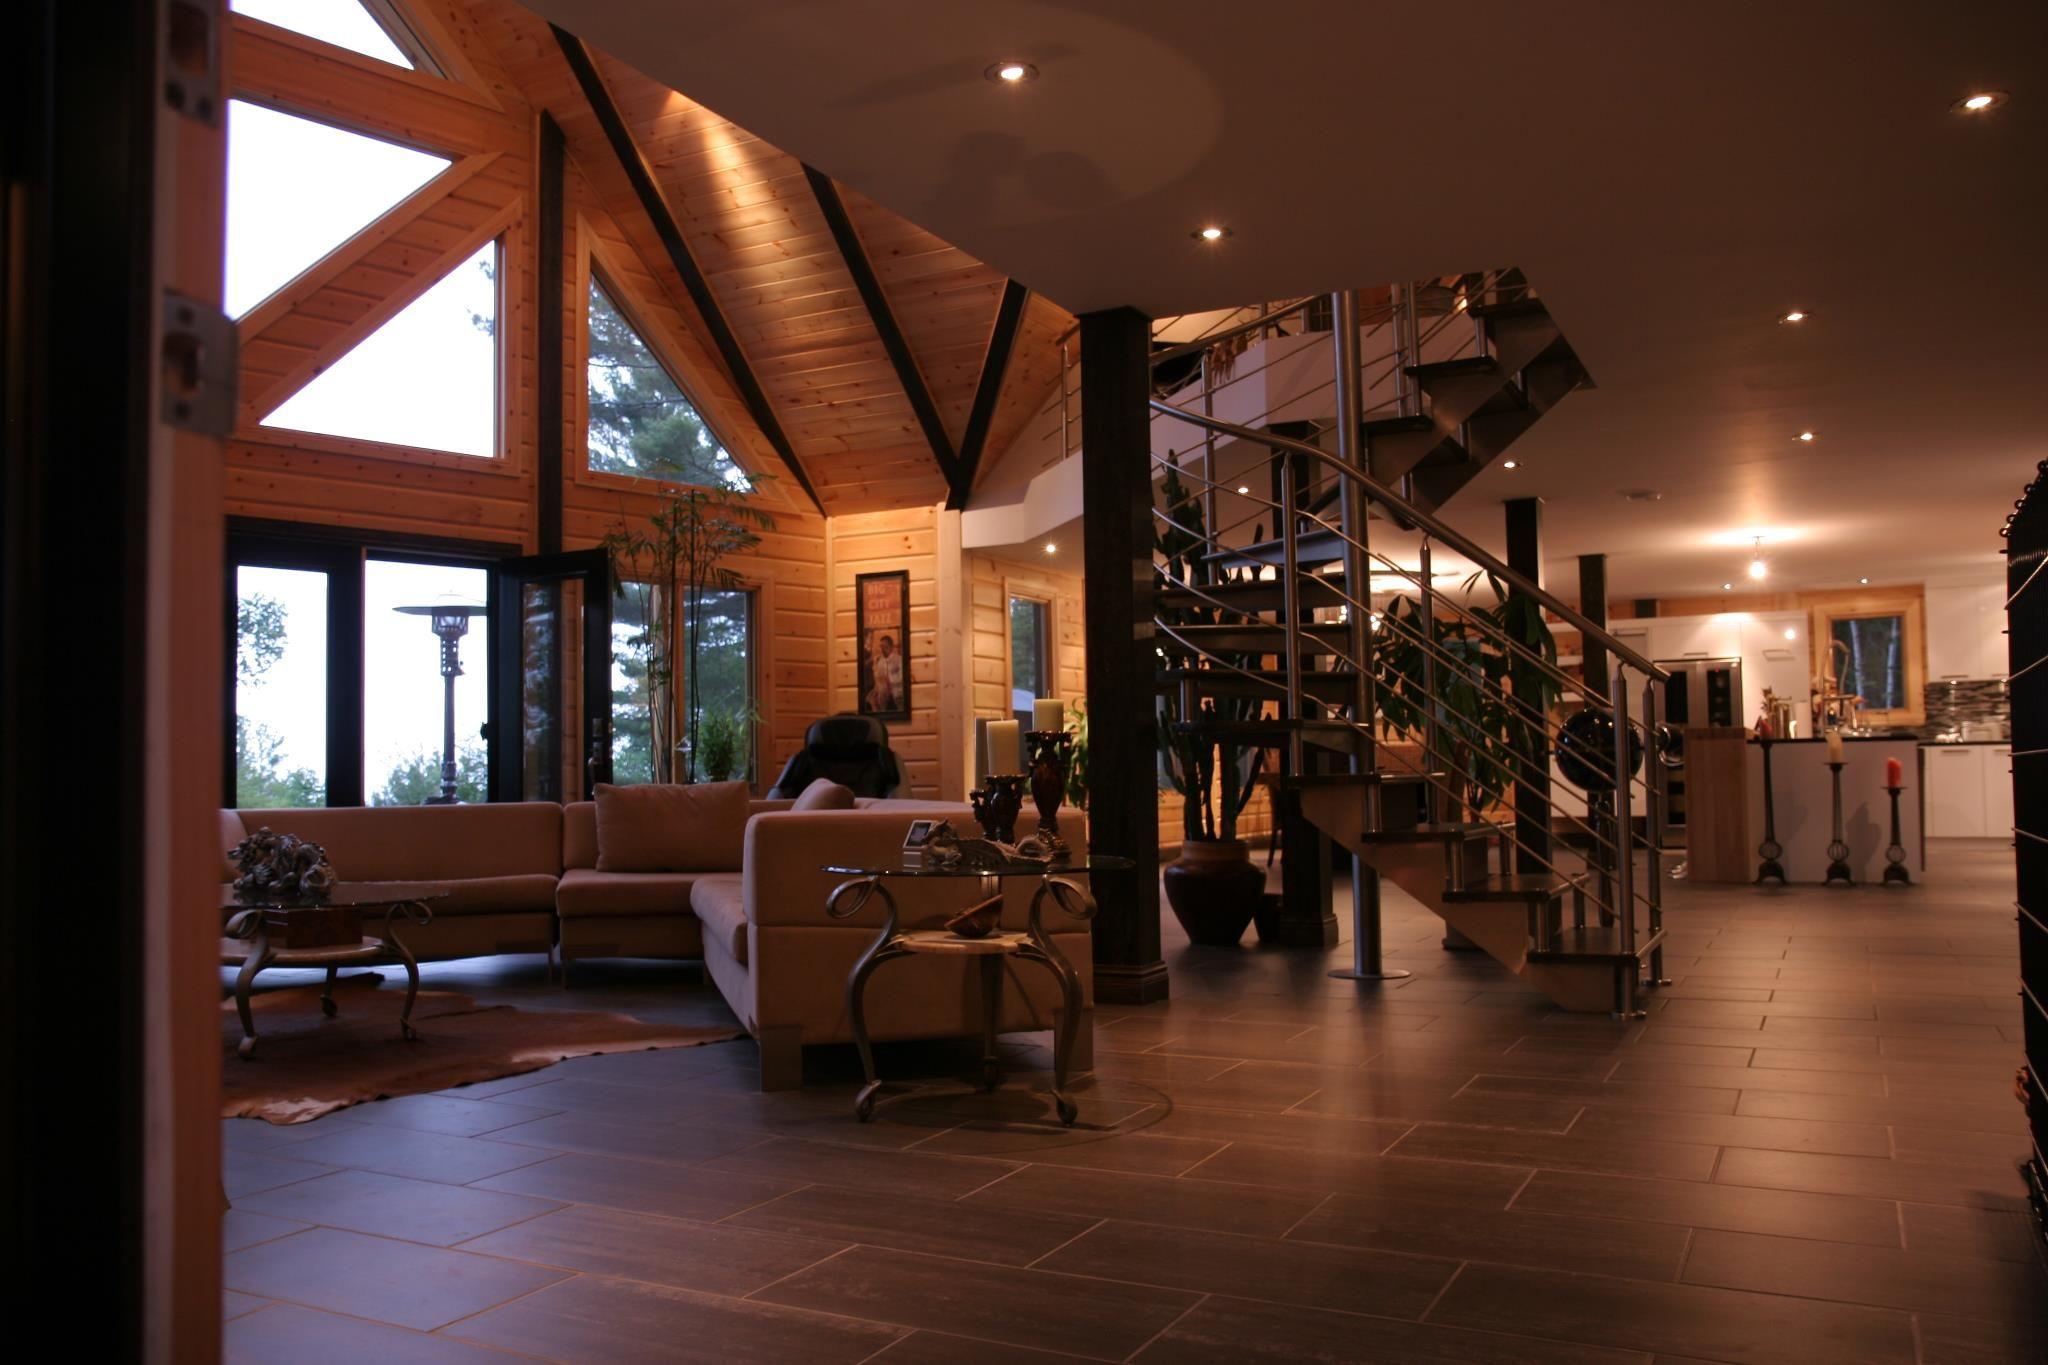 buying log home modern interior in interior modern ideas with log home modern interior modern home plans ideas